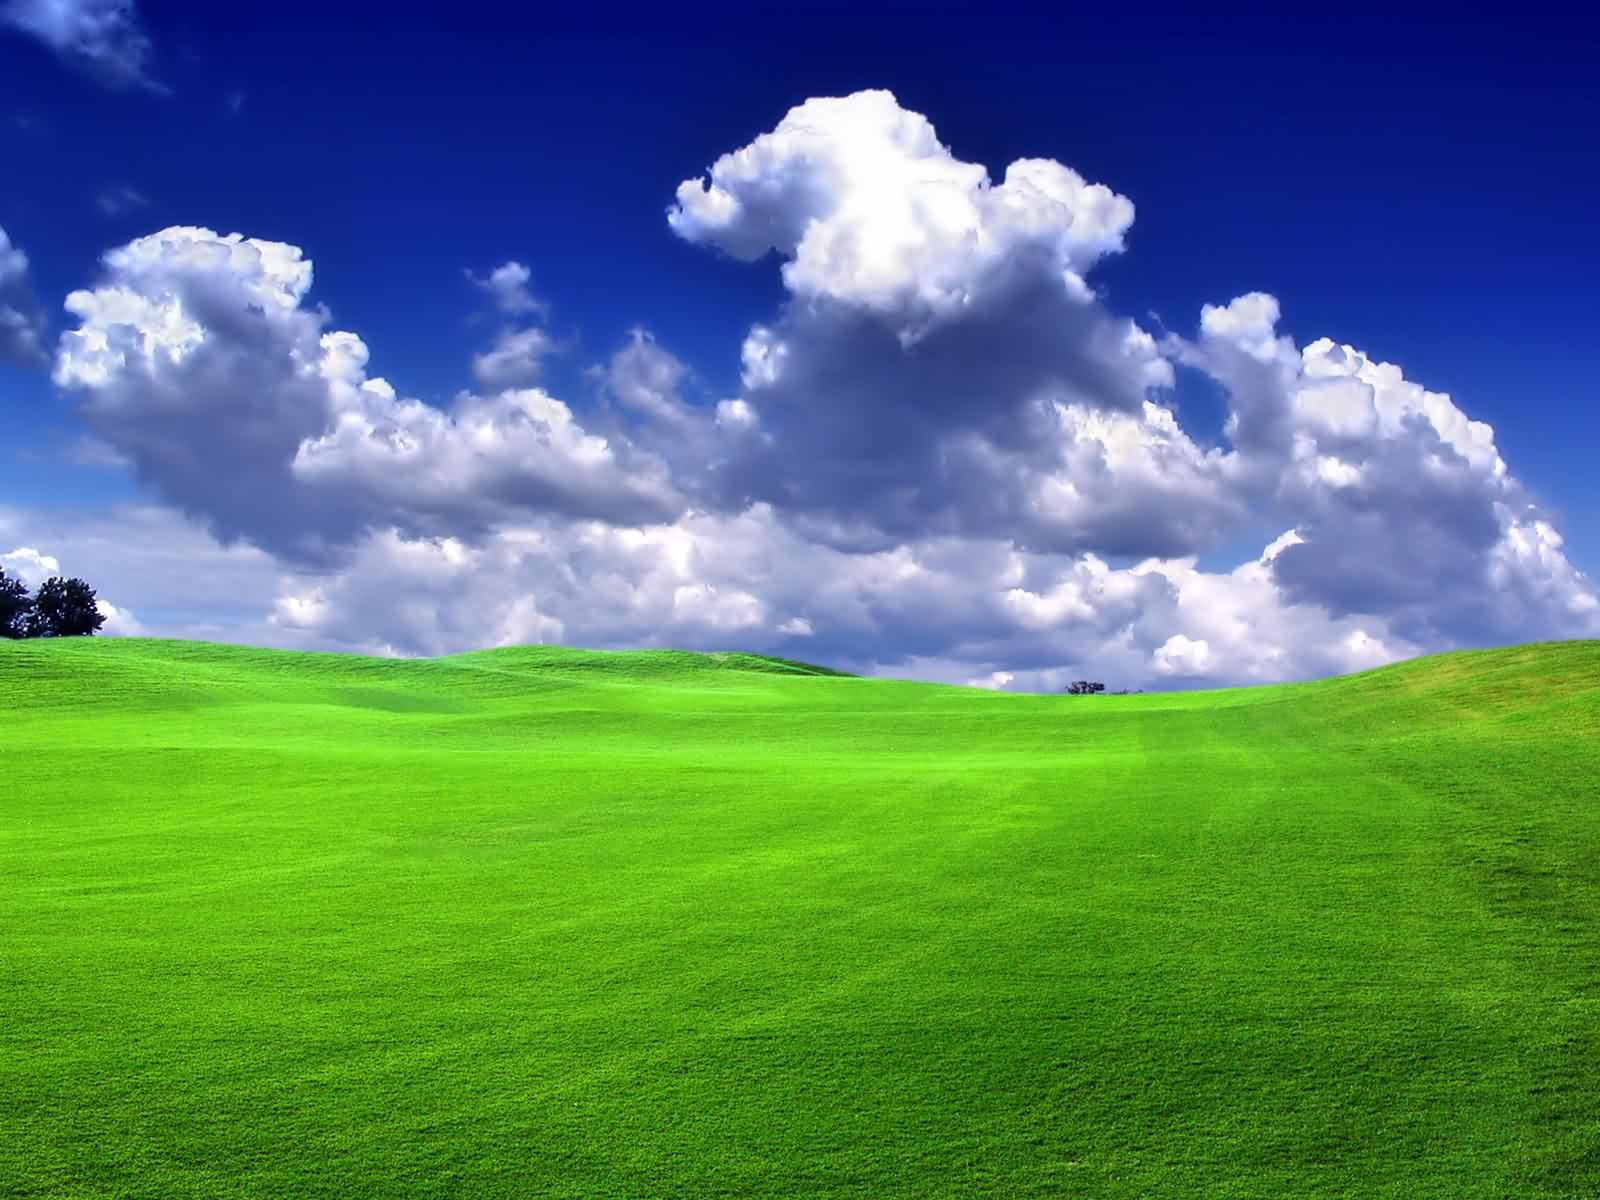 Windows Xp HD Wallpaper - Wallpapers